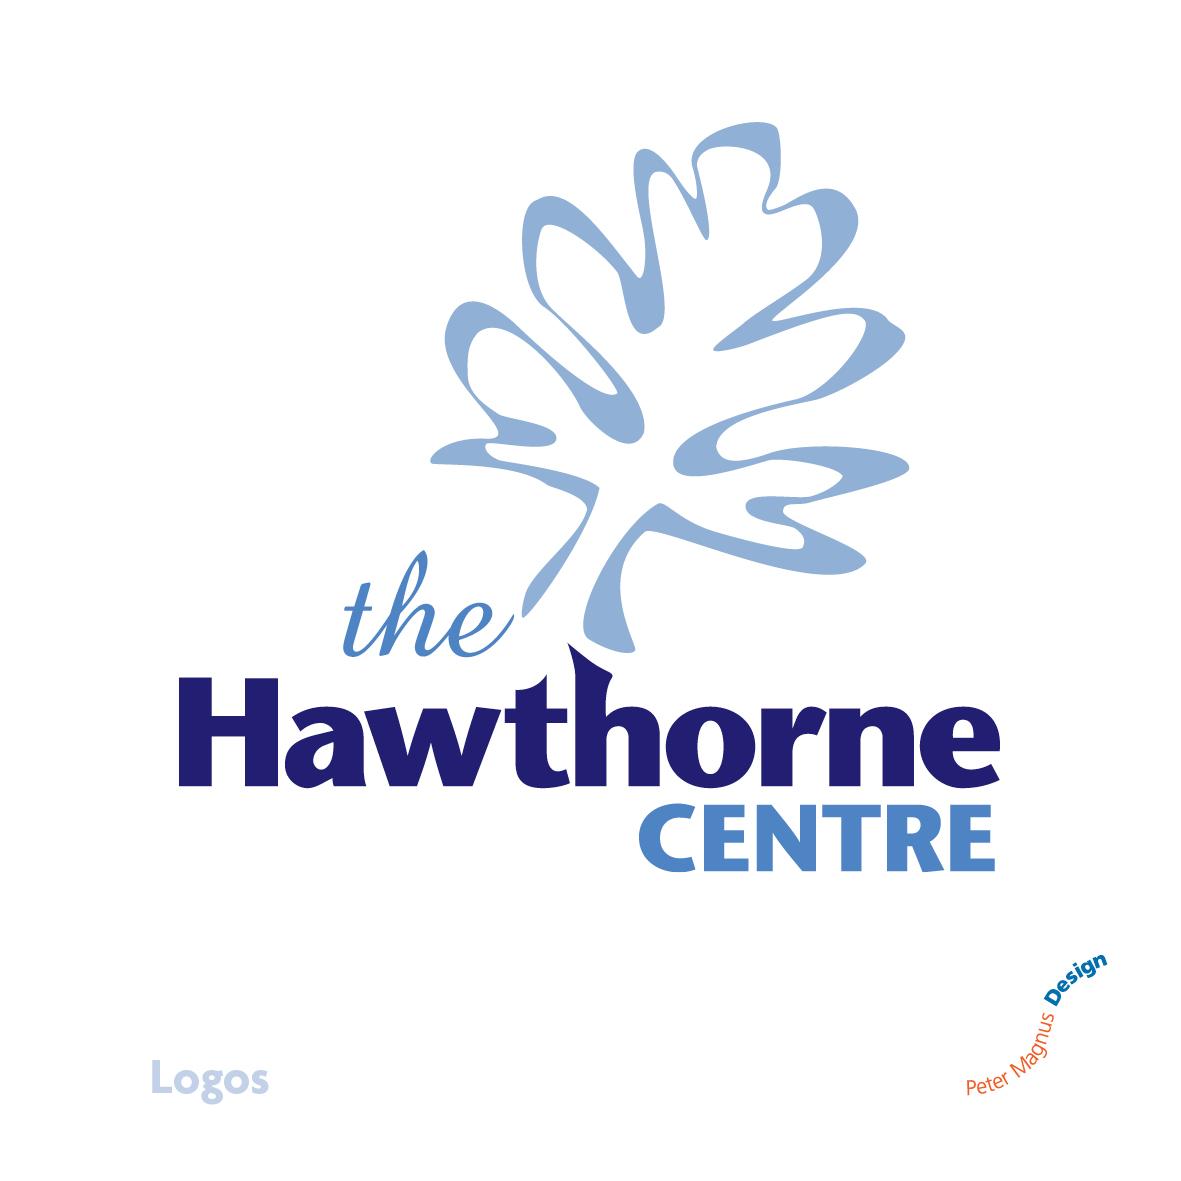 The Hawthorne Centre logo, Welwyn Garden City, Herts